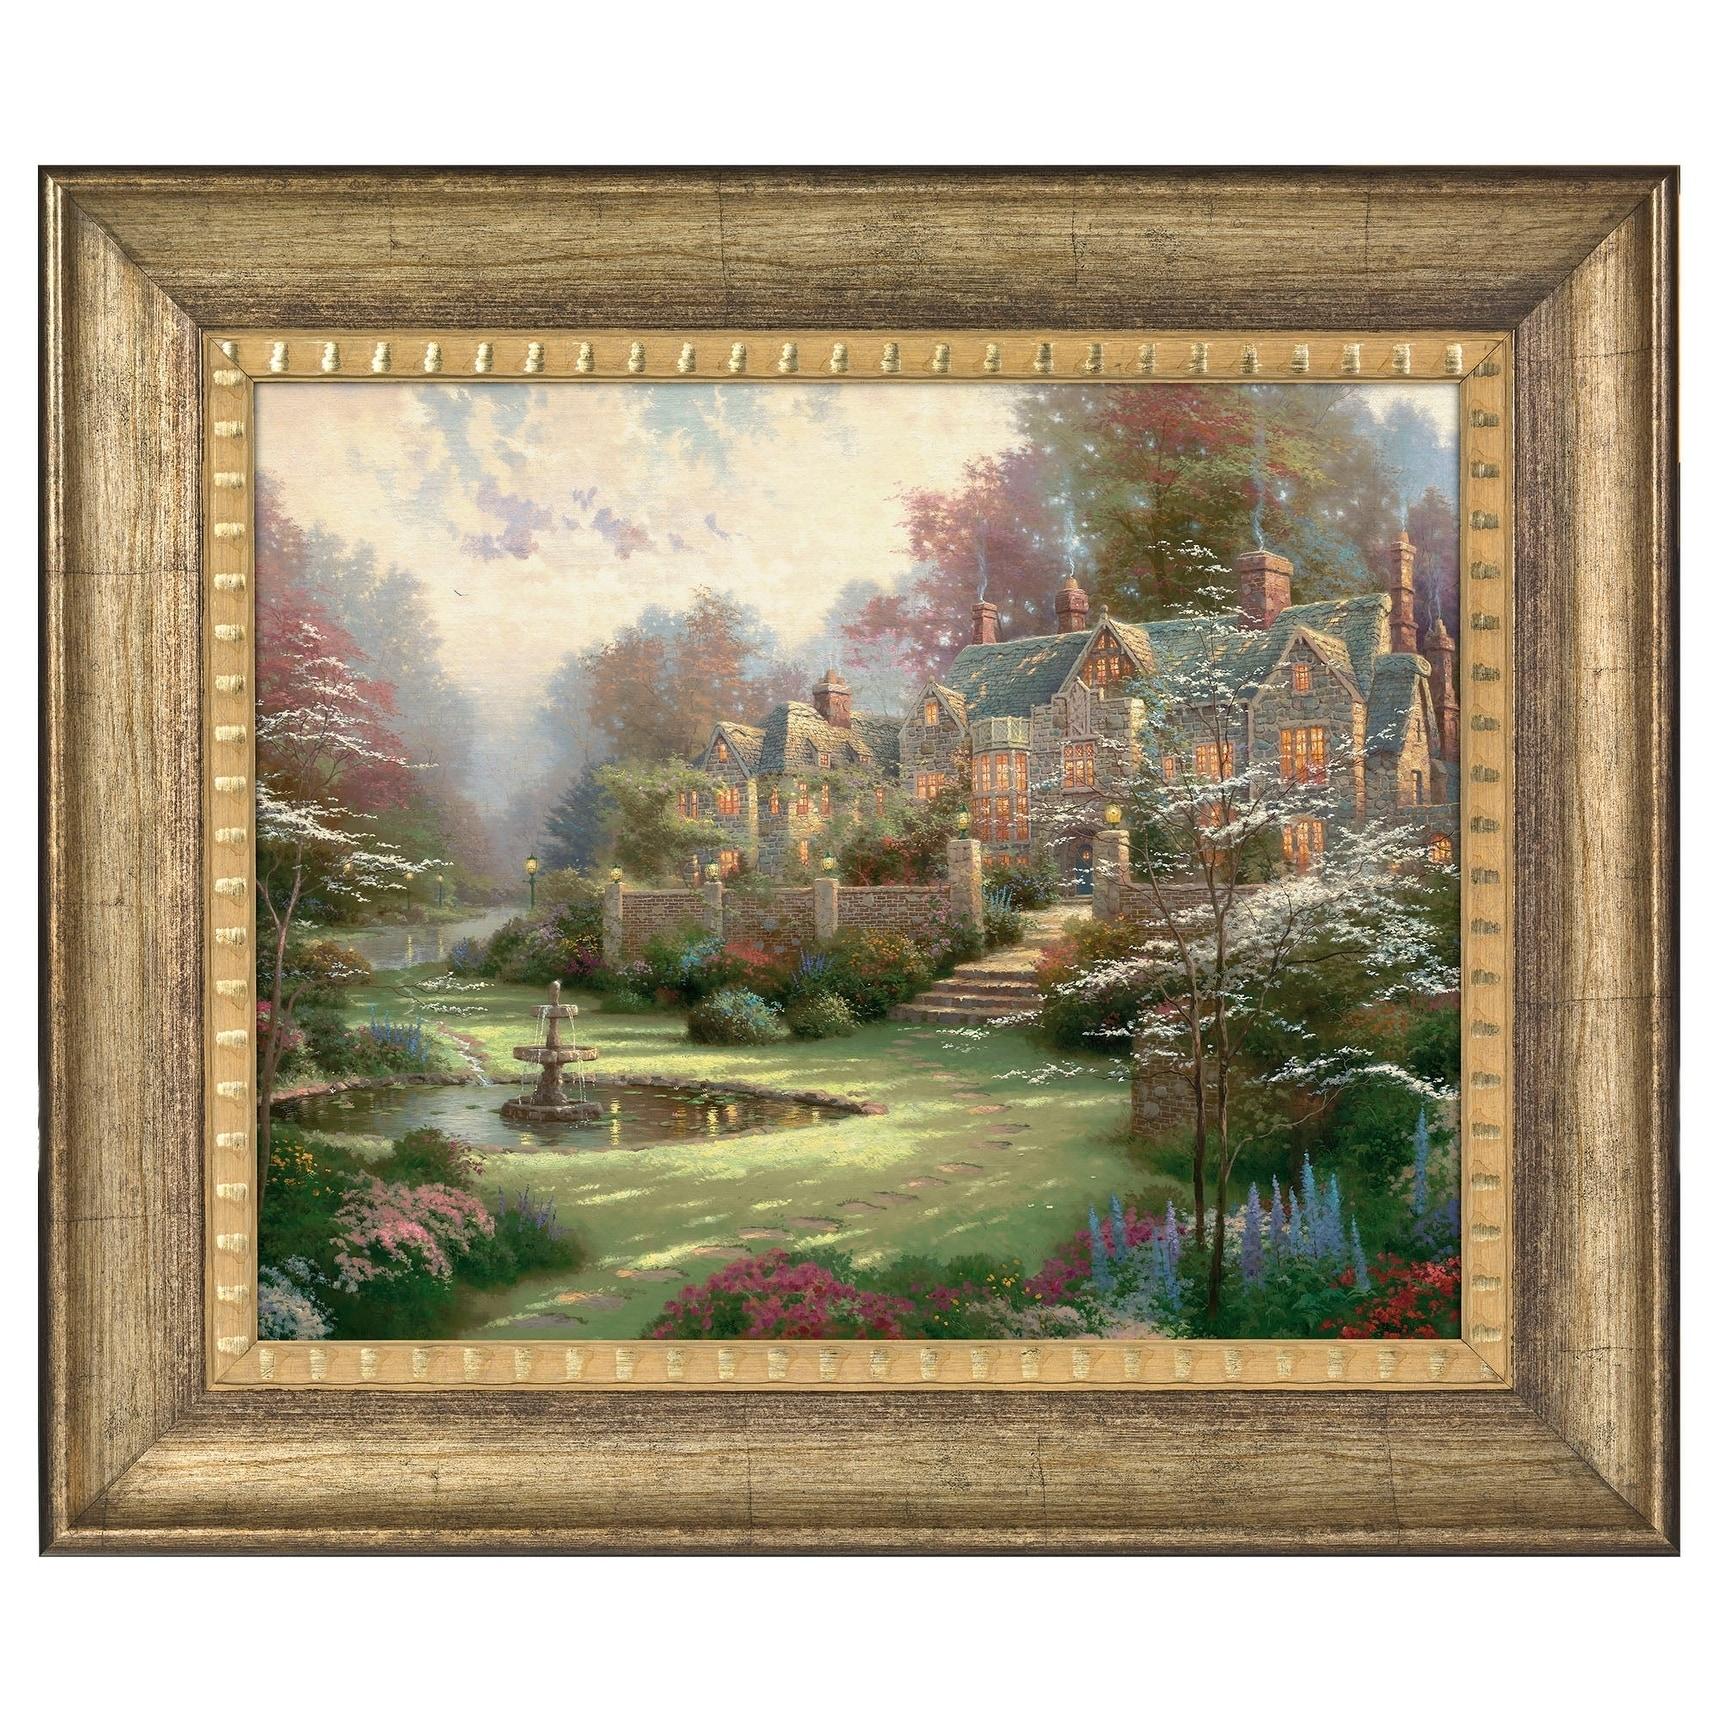 d6ffe630b4d Shop Thomas Kinkade Gardens Beyond Spring Gate 16 x 20 Brushstroke Vignette  - Free Shipping Today - Overstock - 18271778